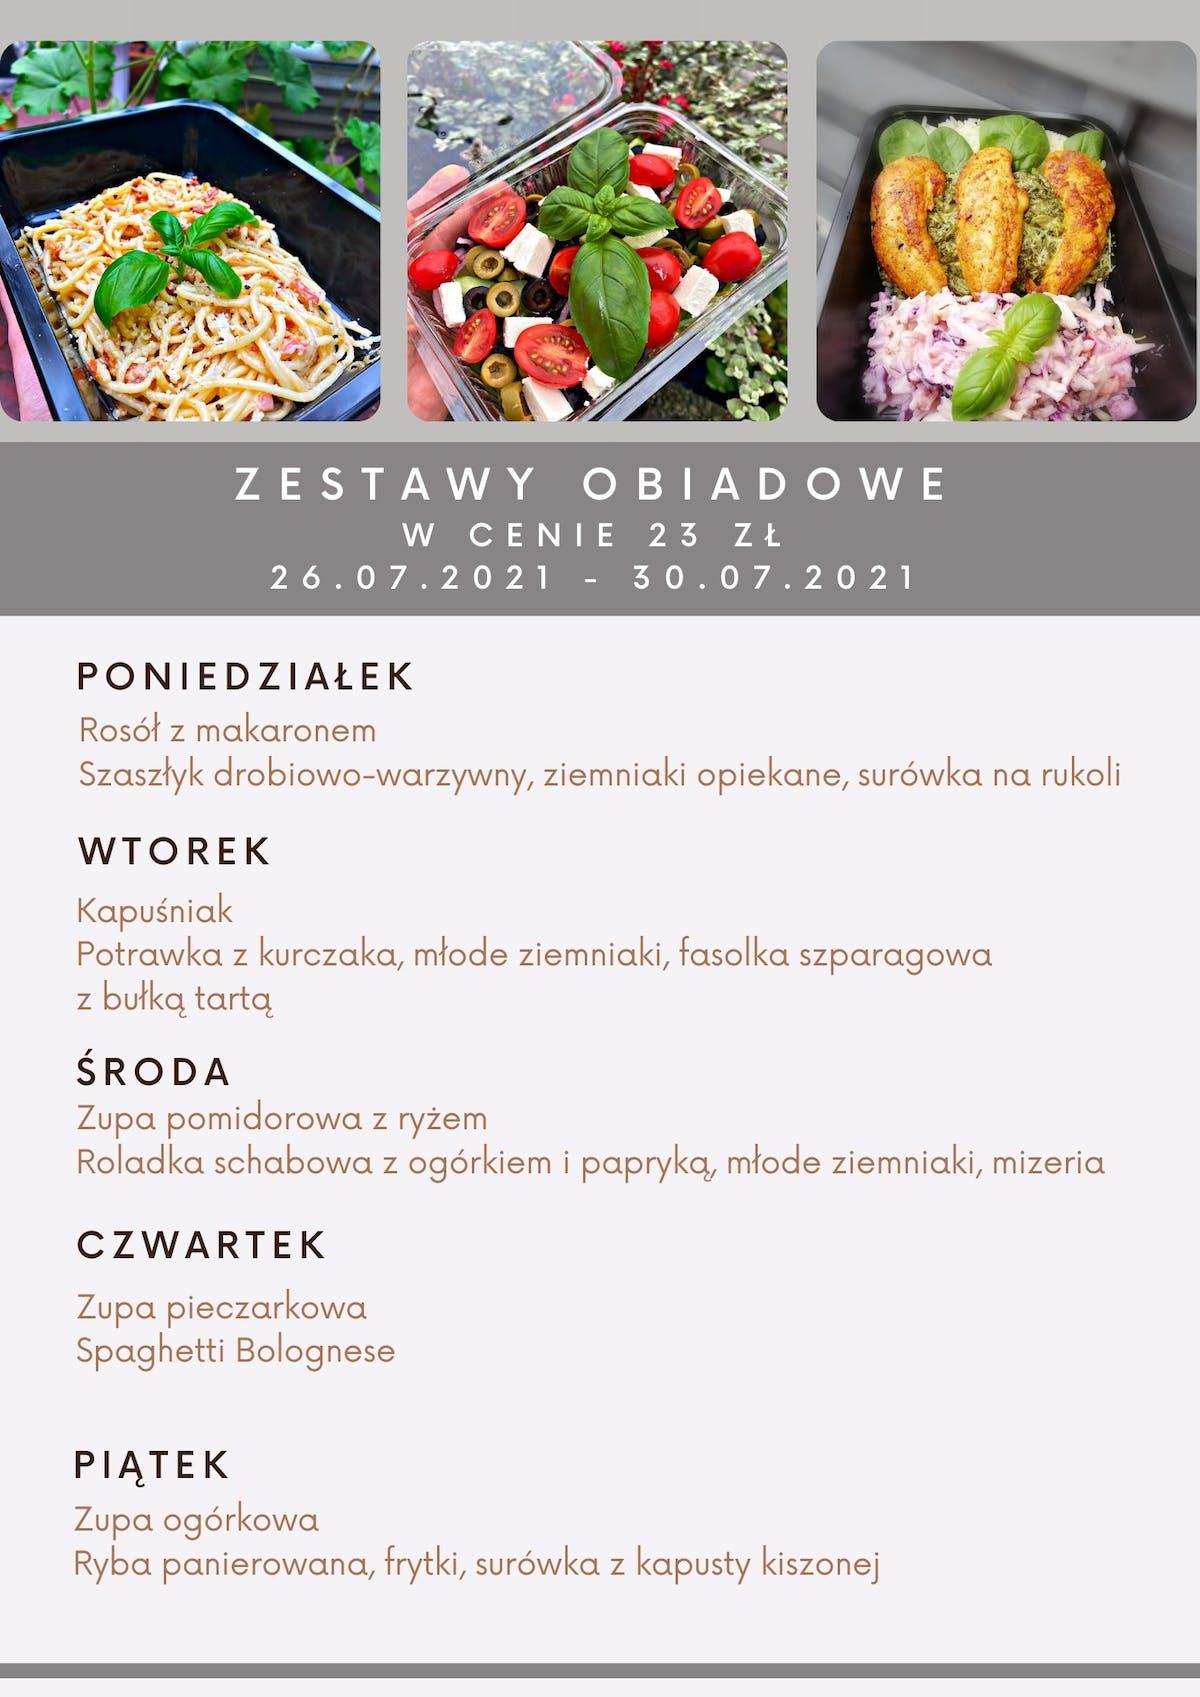 Zestaw Obiadowy